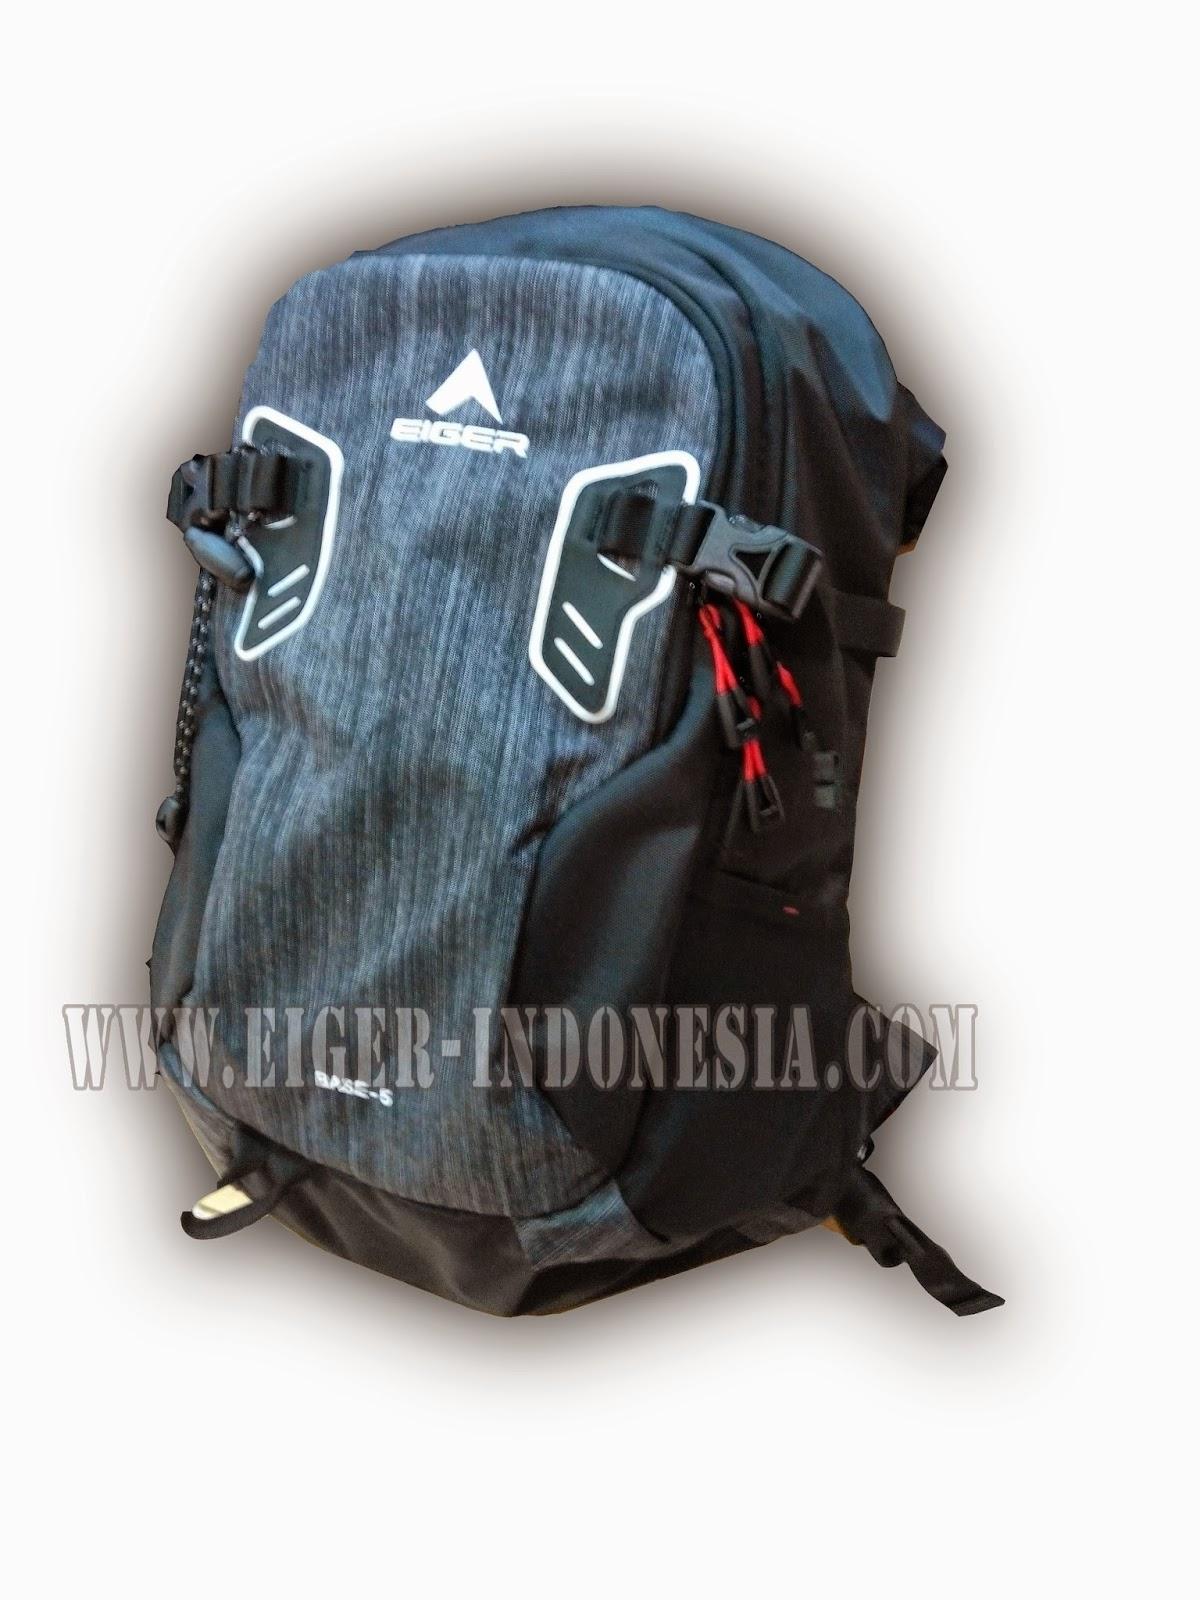 http://www.eiger-indonesia.com/2014/11/tas-eiger-2265-r-base-5.html